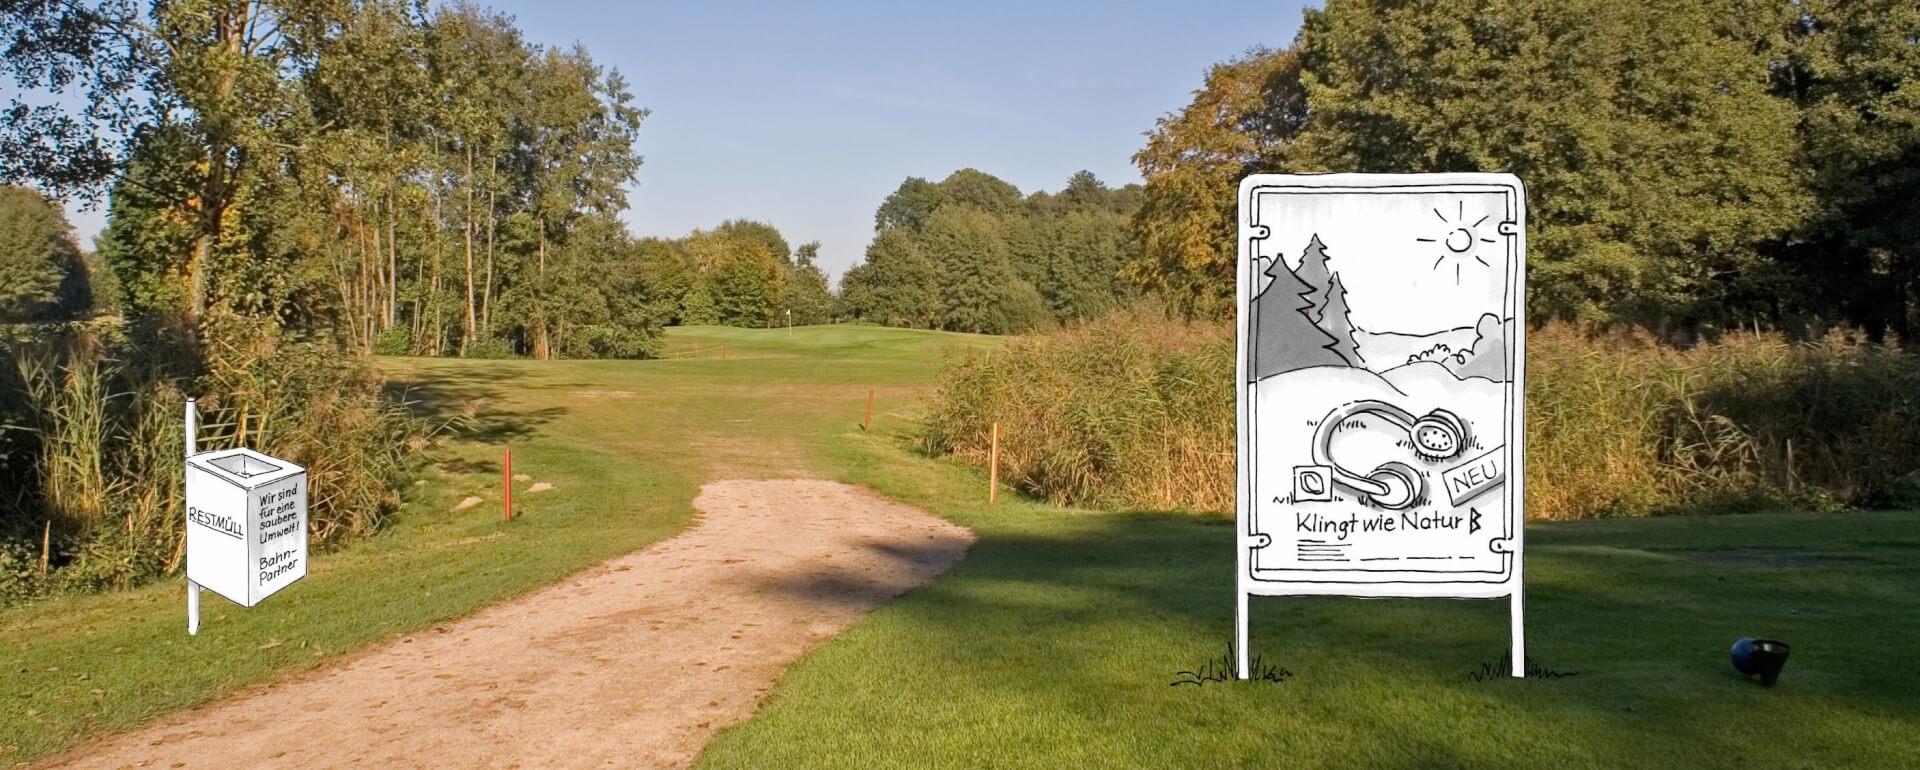 https://golfclub-peckeloh.de/wp-content/uploads/2018/03/PICT0297-e1520438606412.jpg